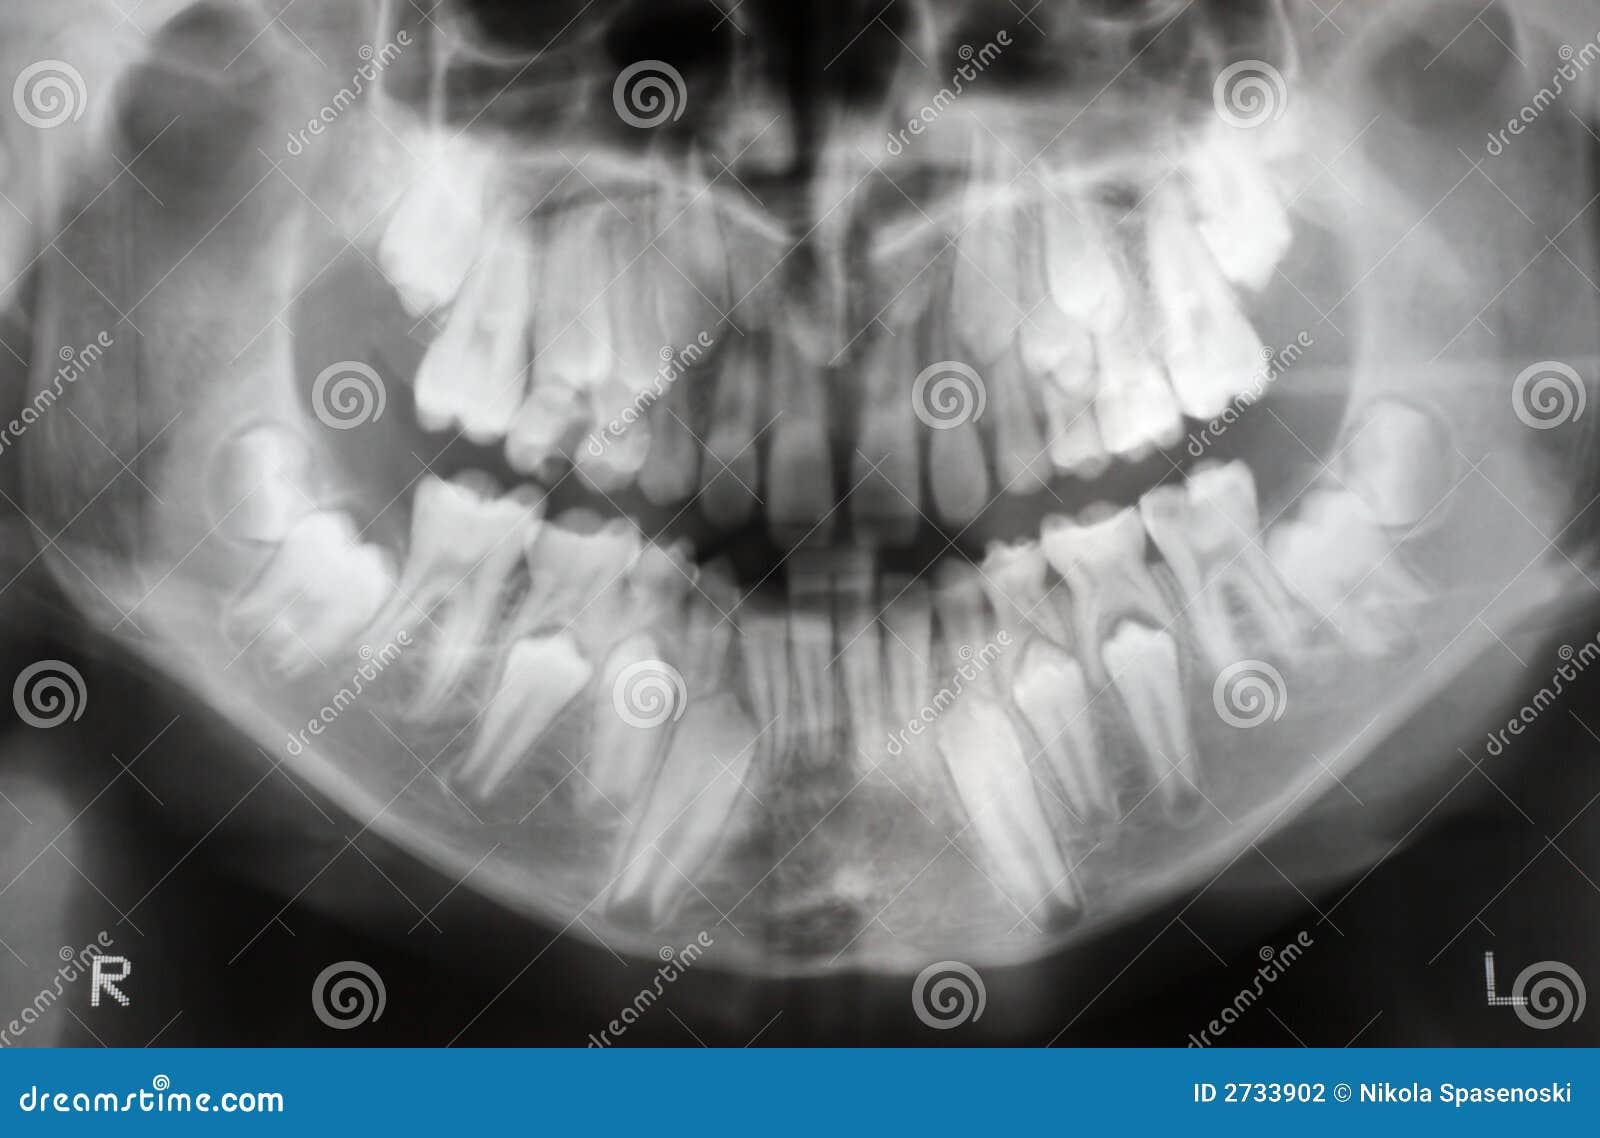 Рентген детей с молочными зубами